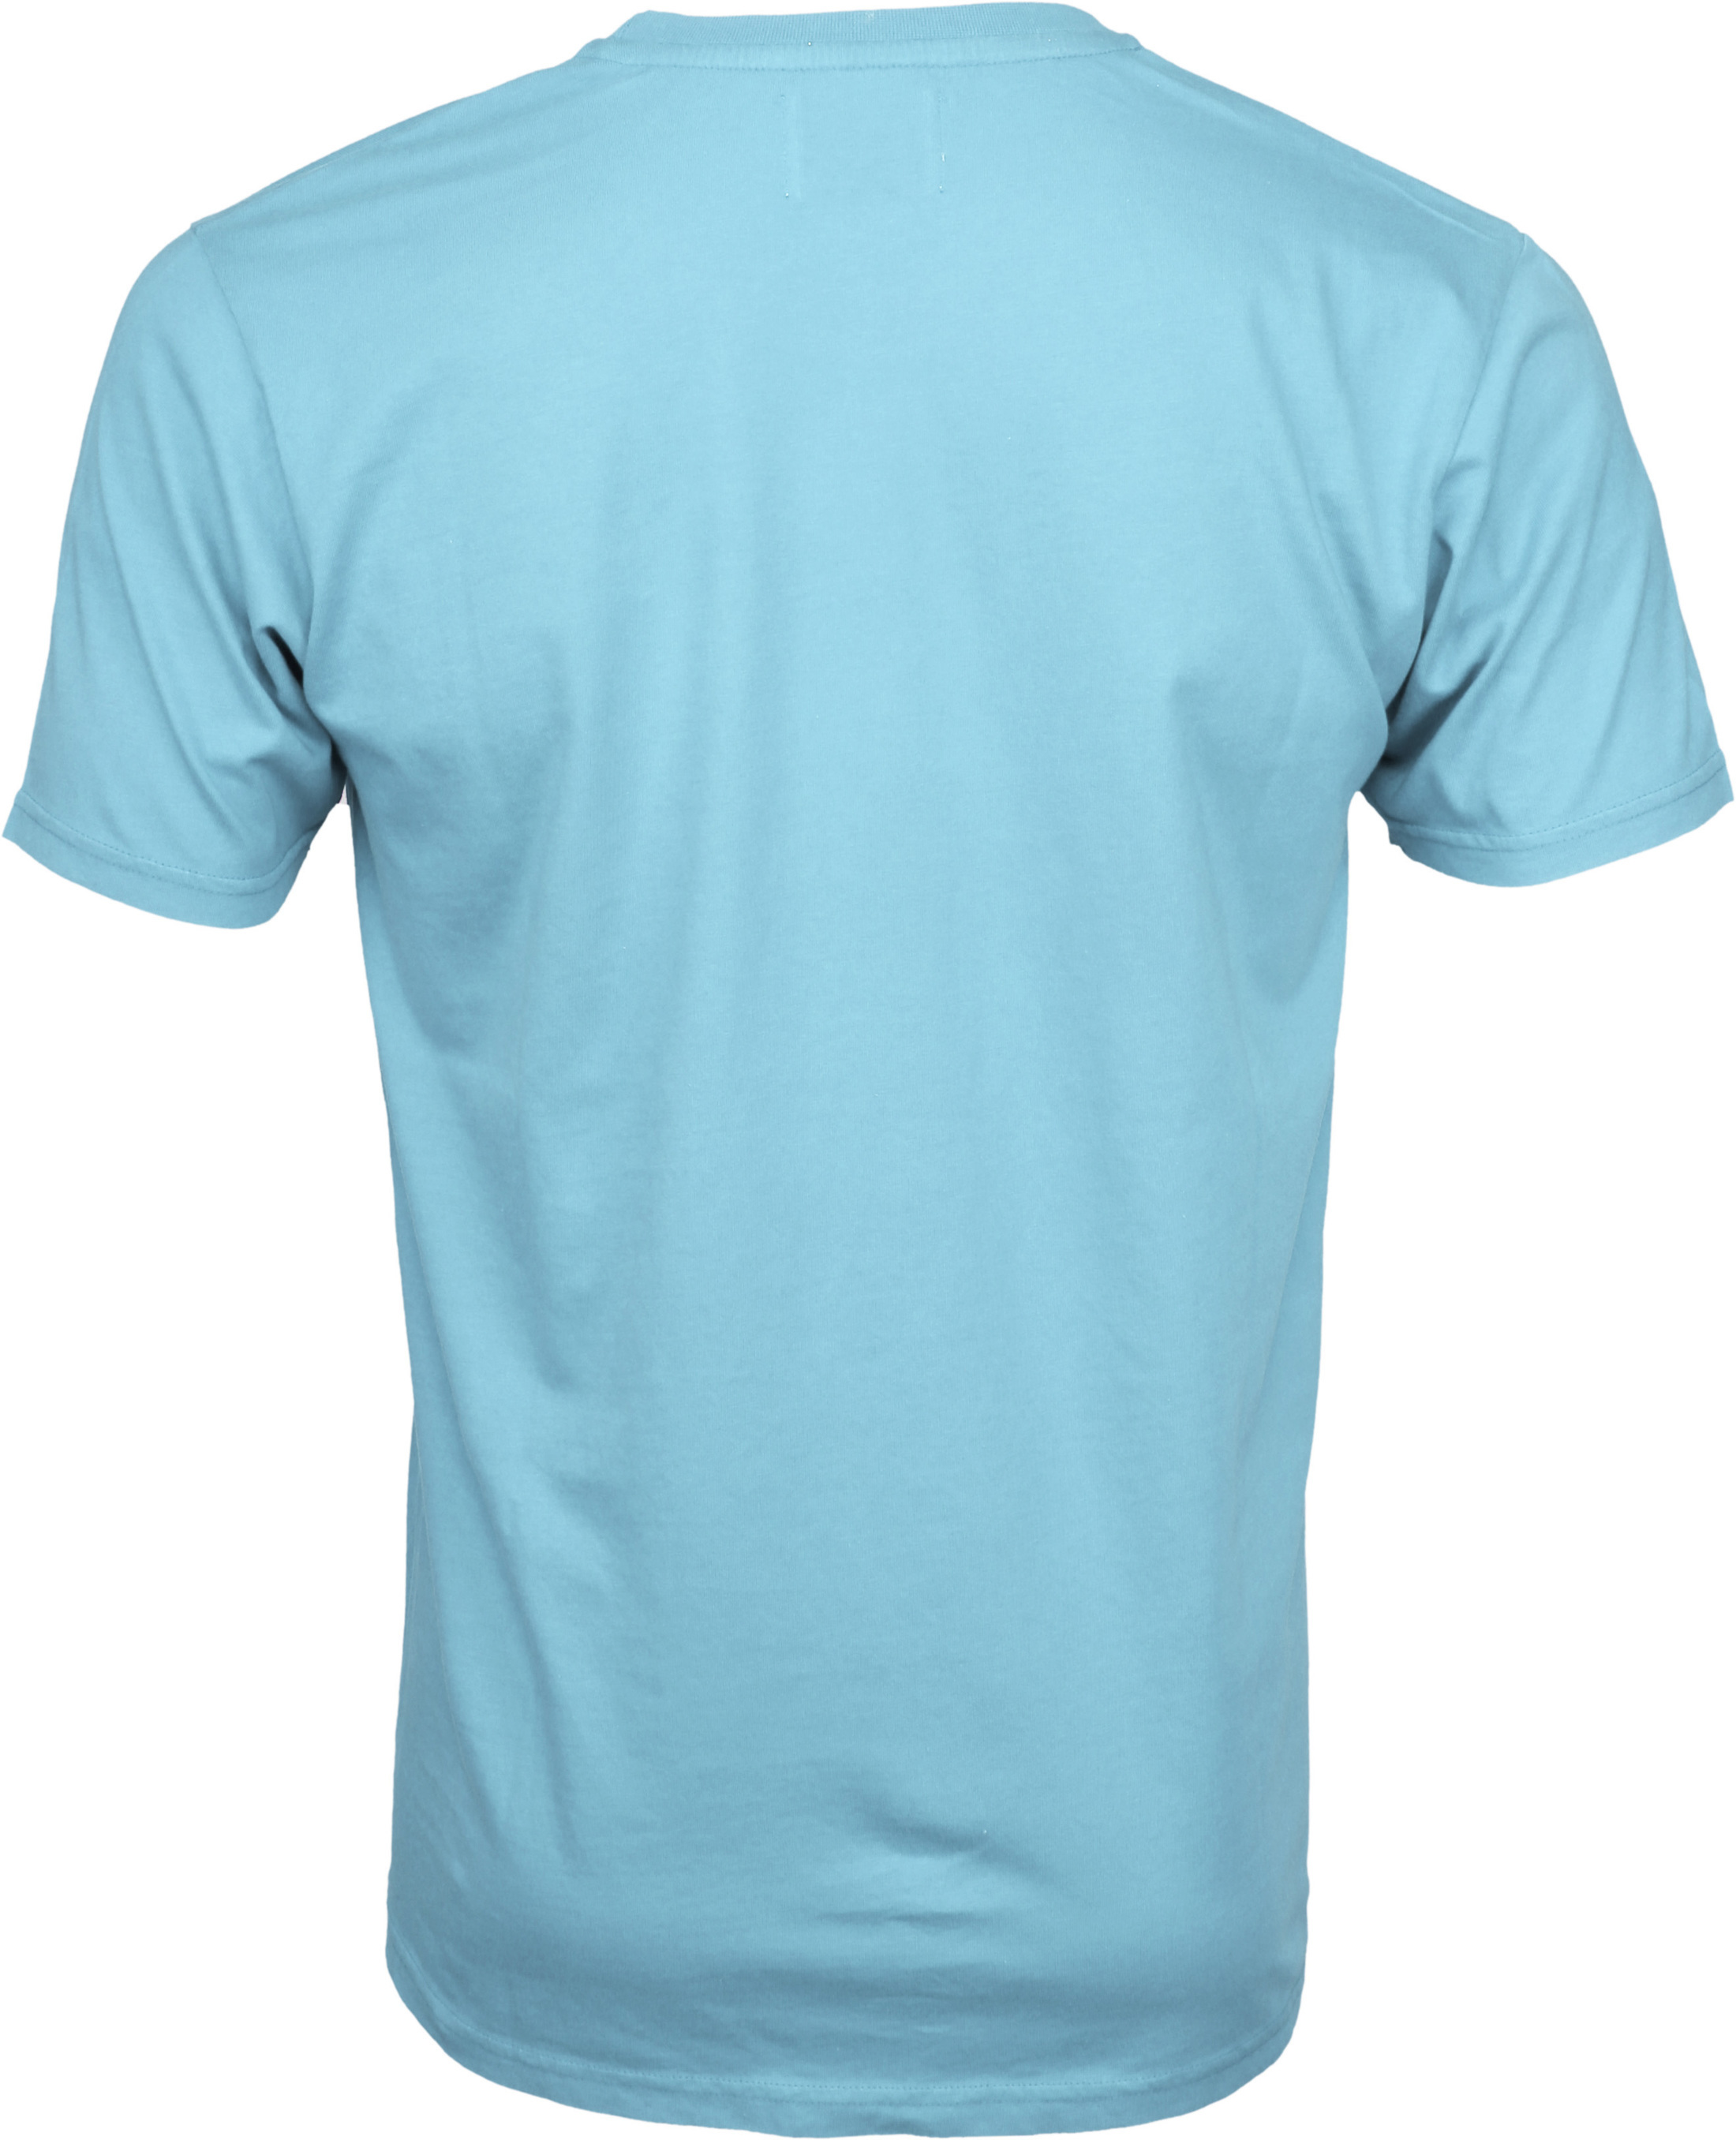 Colorful Standard T-shirt Polar Blue foto 2